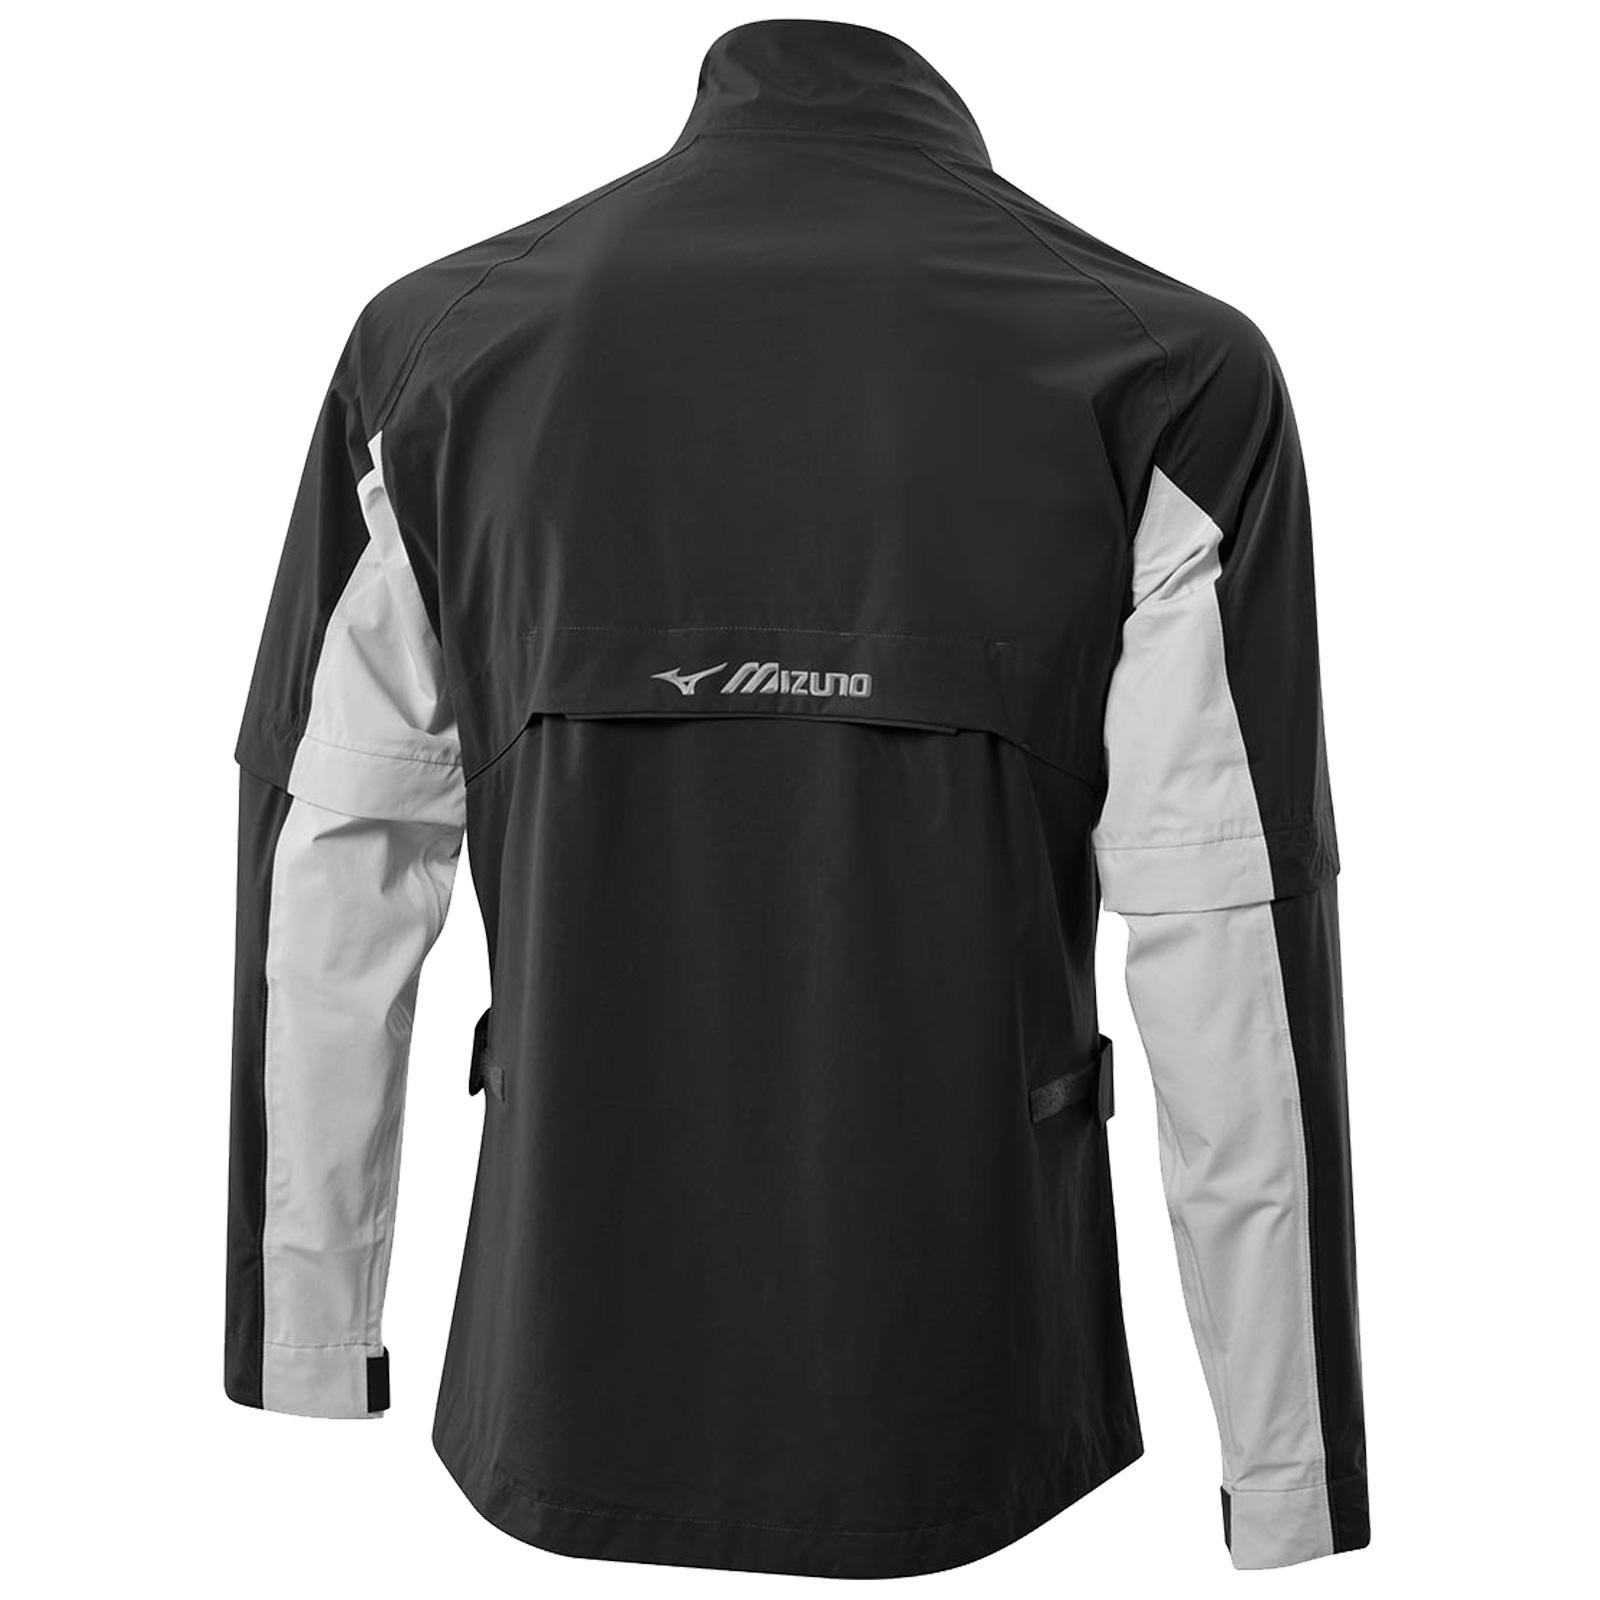 Mizuno-Mens-Impermalite-F20-Waterproof-Rain-Jacket-Top-Lightweight-Coat-Golf thumbnail 3